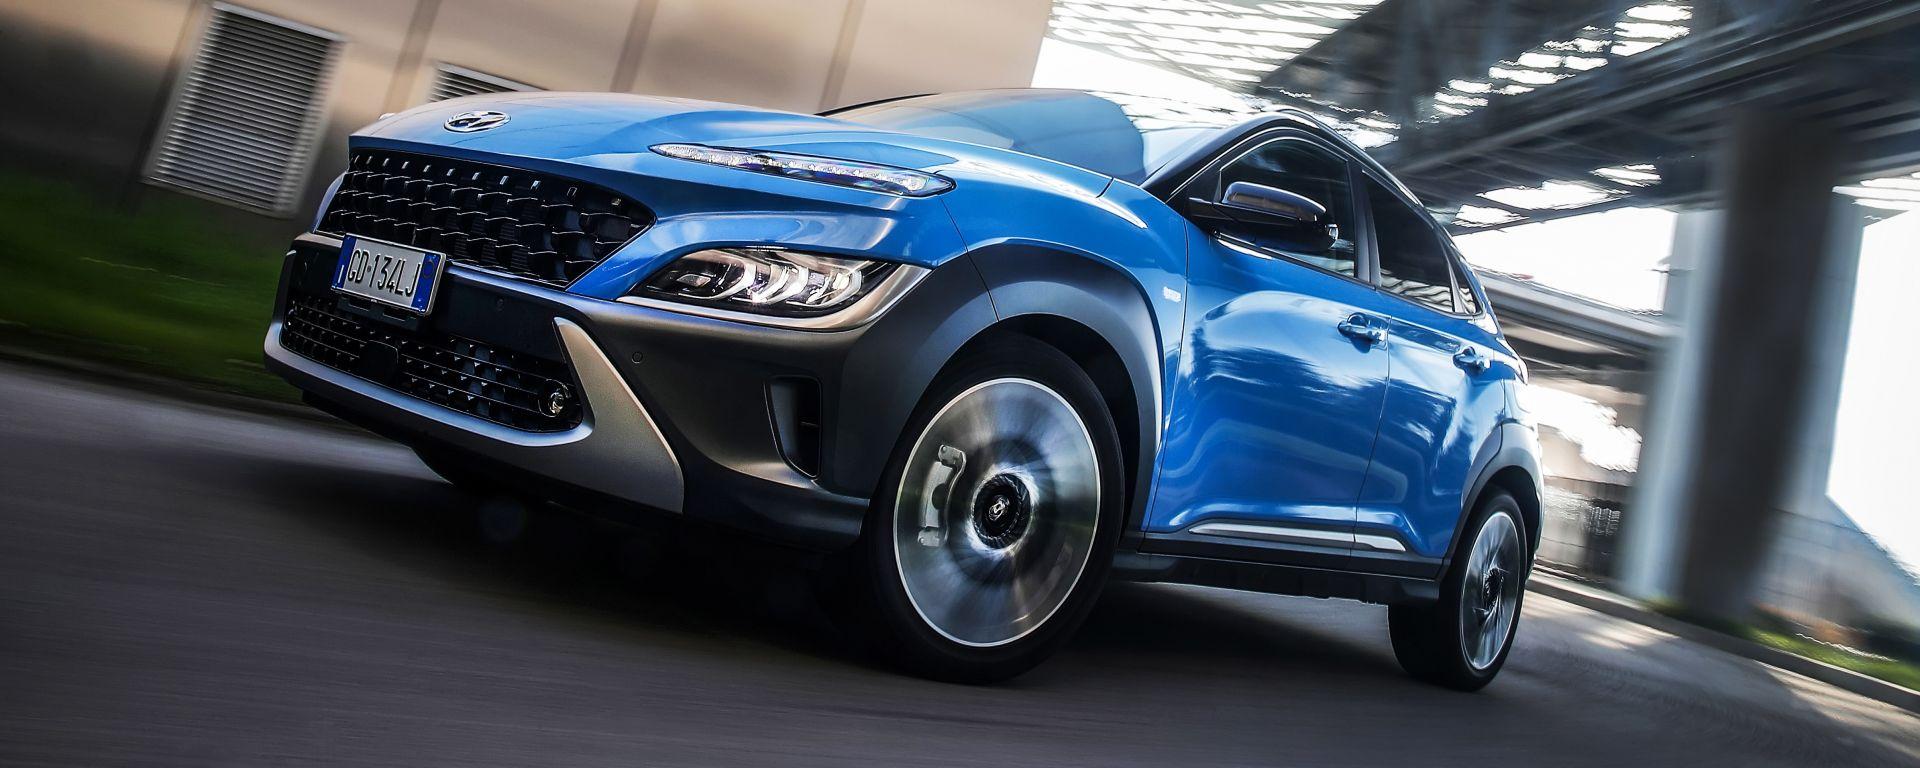 Nuova Hyundai Kona Hybrid: la prova su strada del B-SUV coreano elettrificato